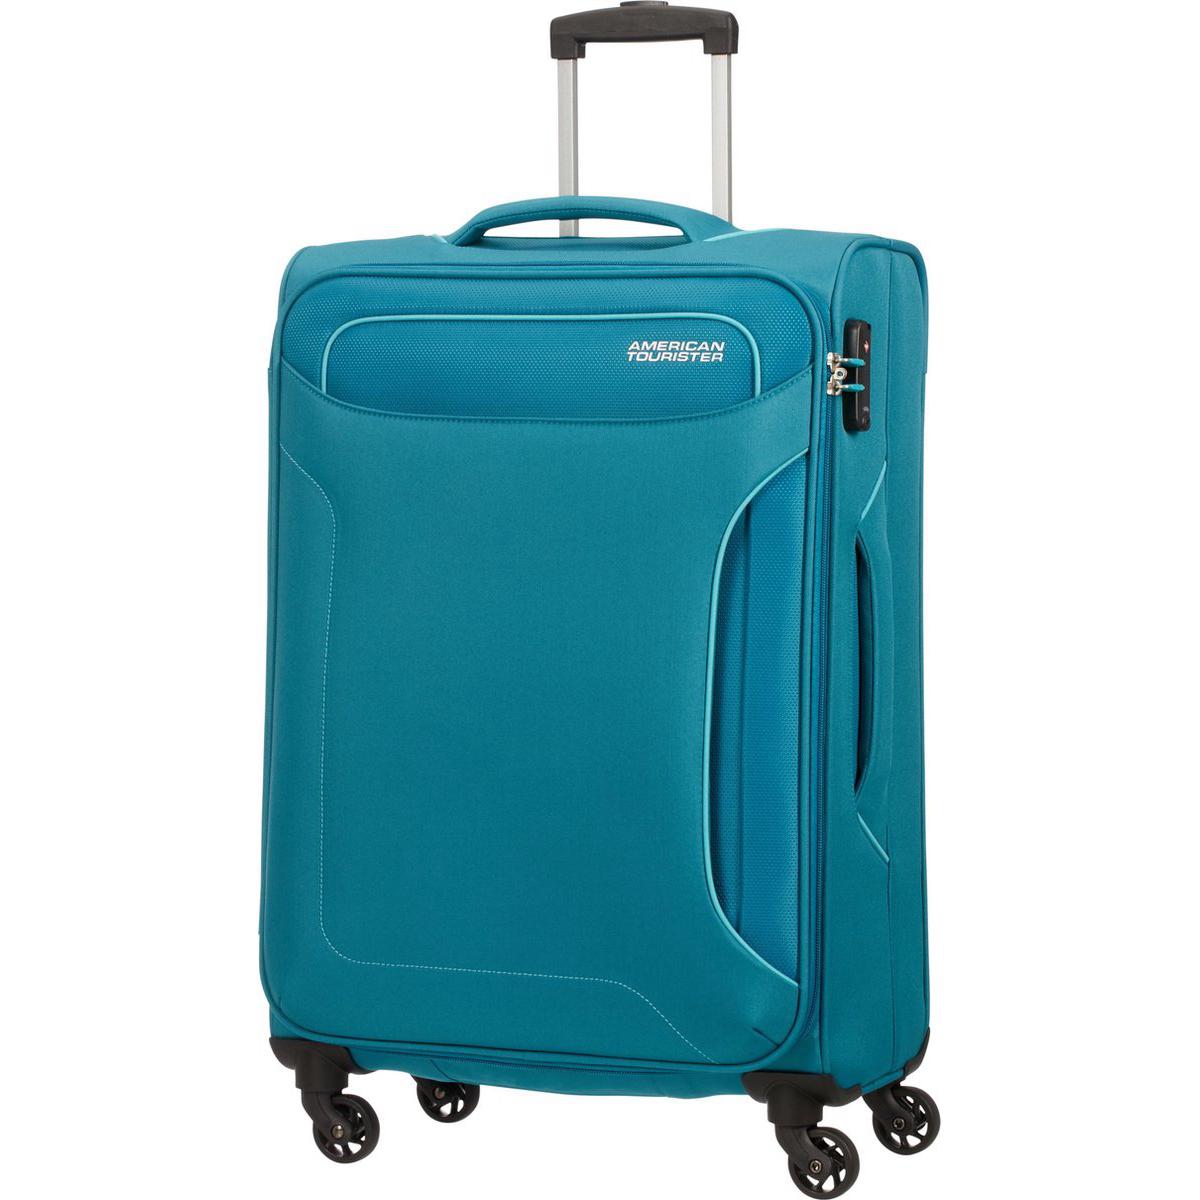 Чемодан American Tourister 4-х колесный сине-зеленый 44х275х67 см.